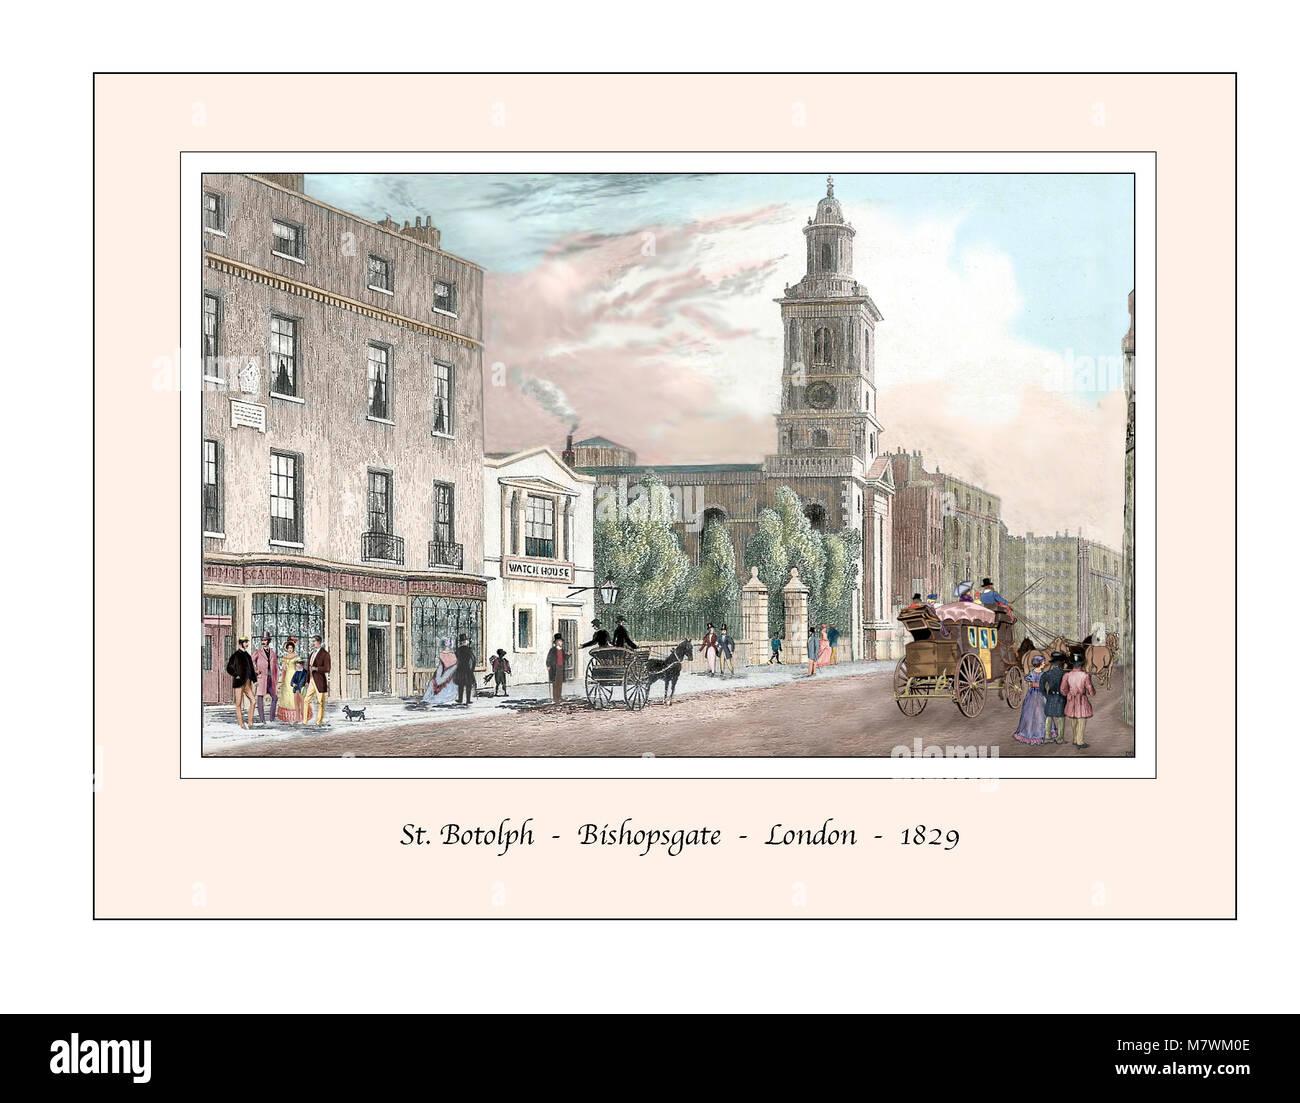 St. Botolph Bishopsgate London Original Design based on a 19th century Engraving - Stock Image